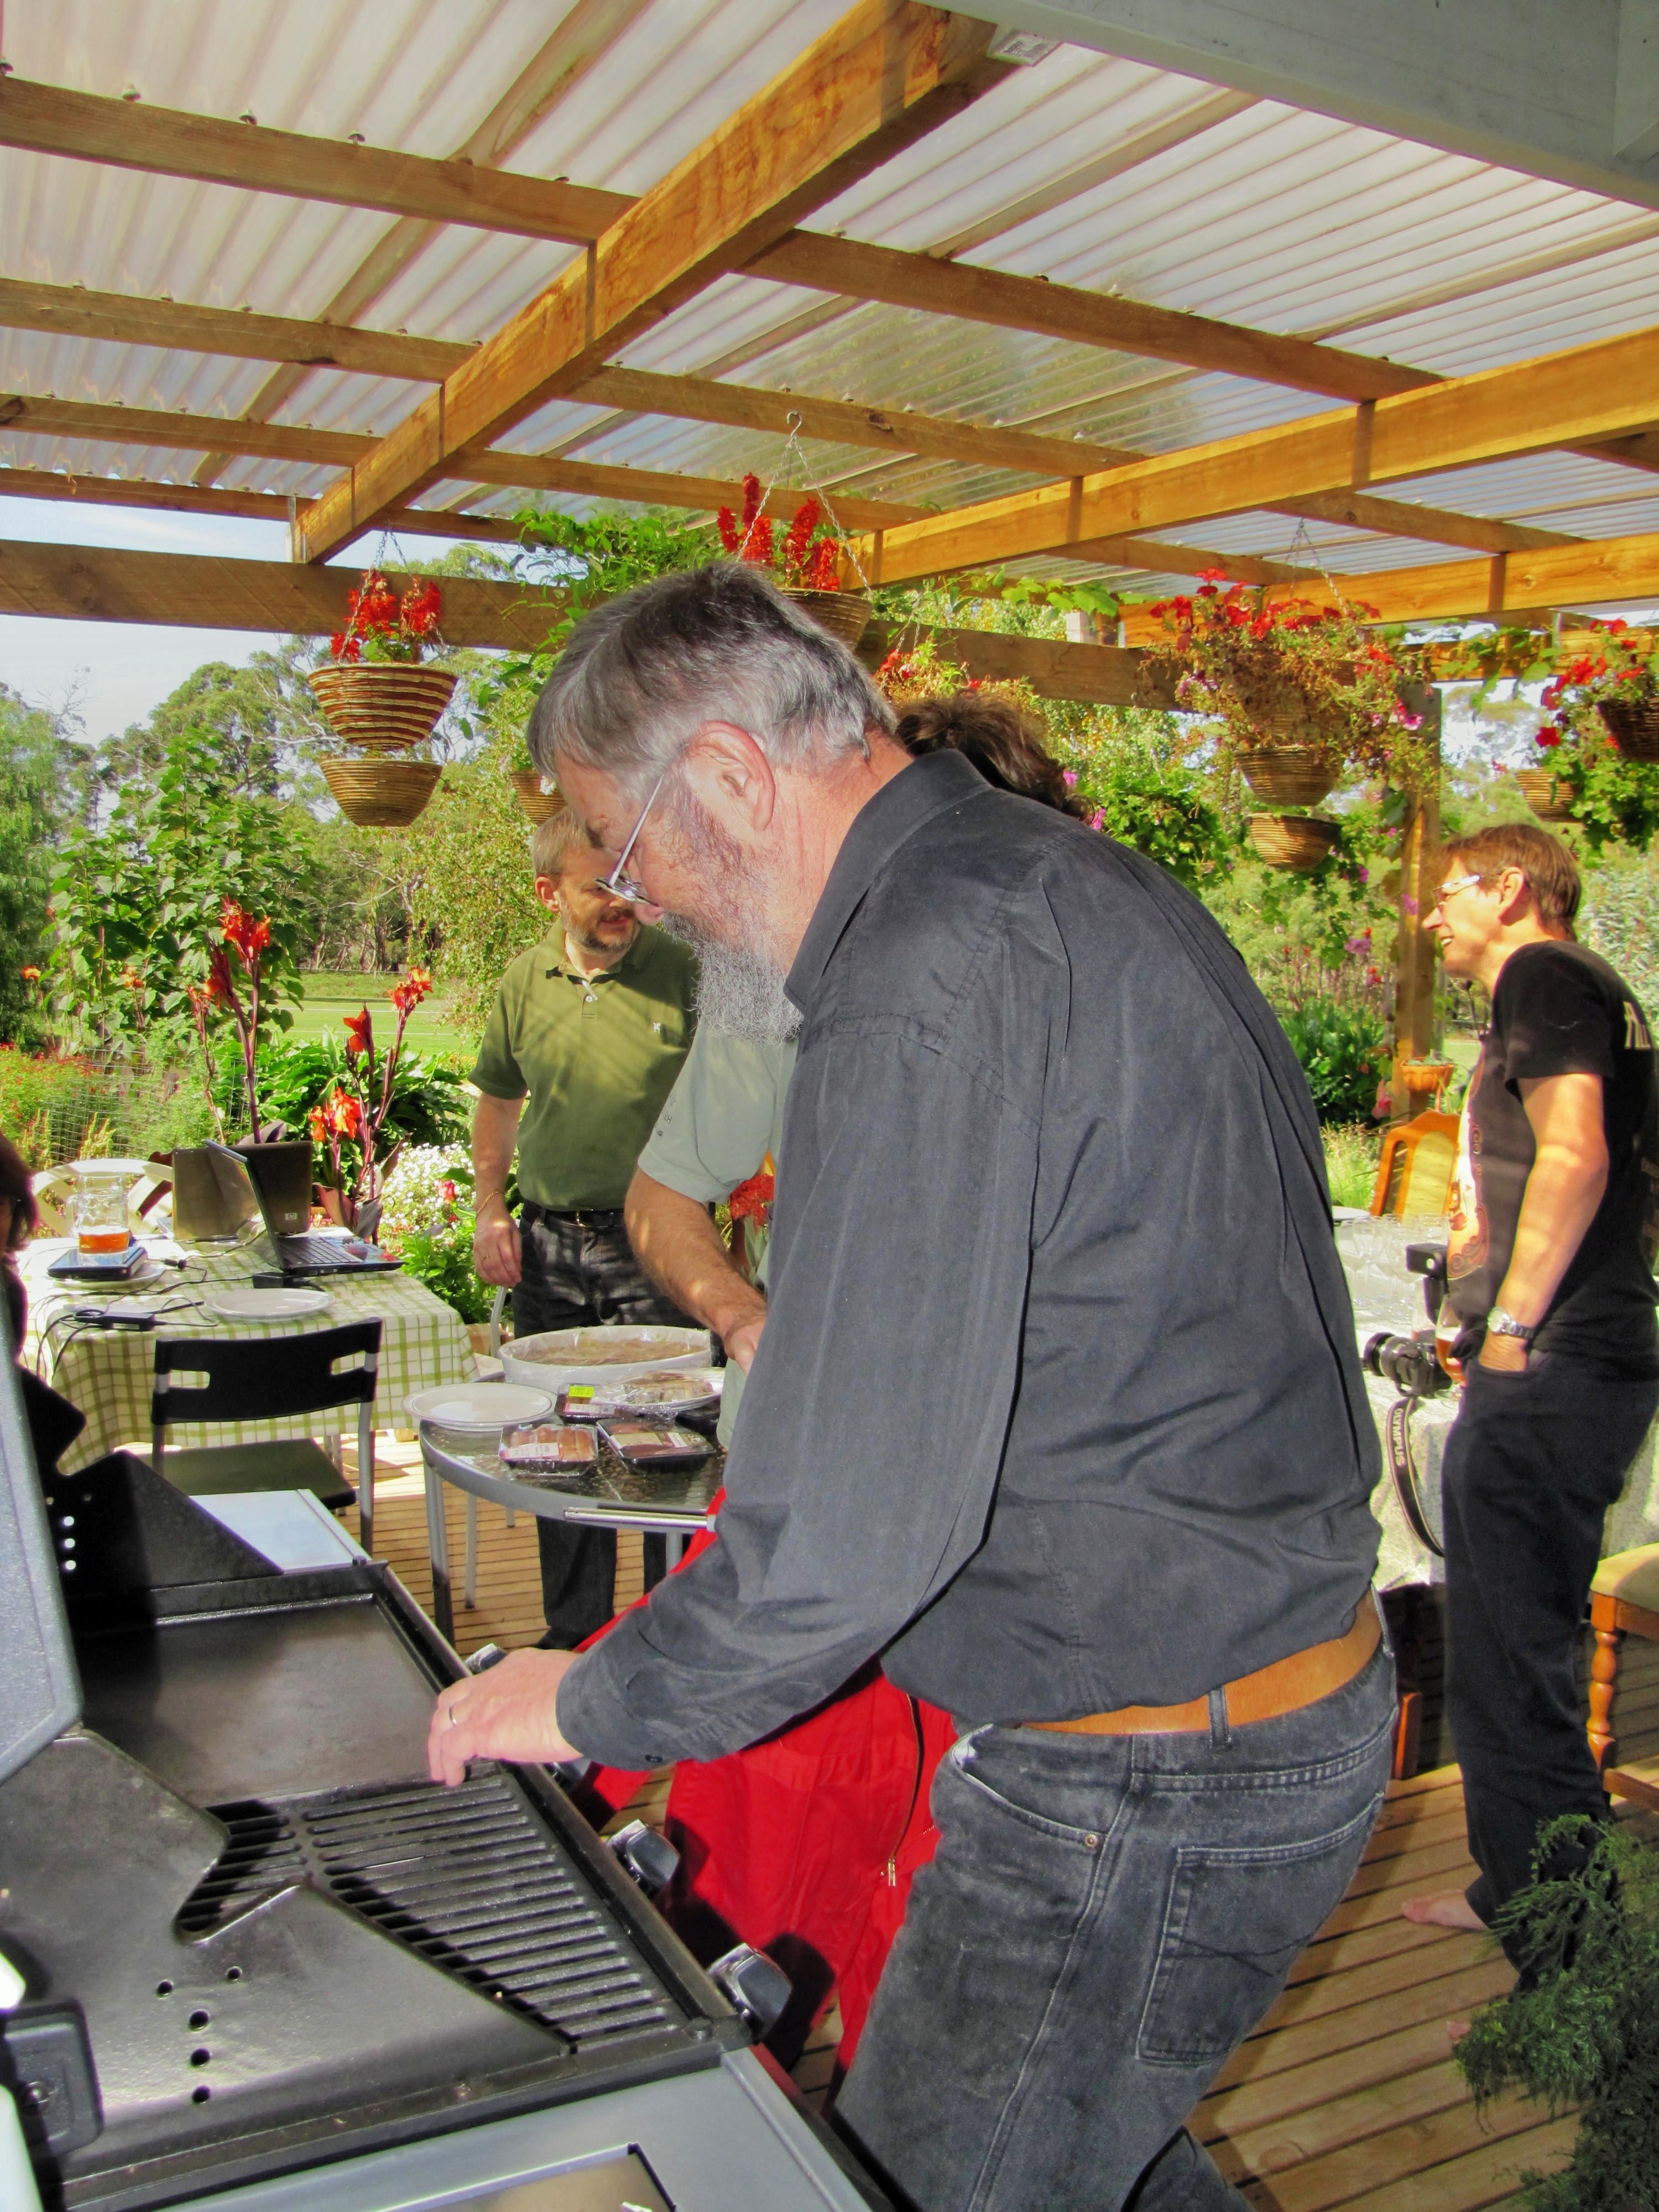 Barbecue-23.jpeg